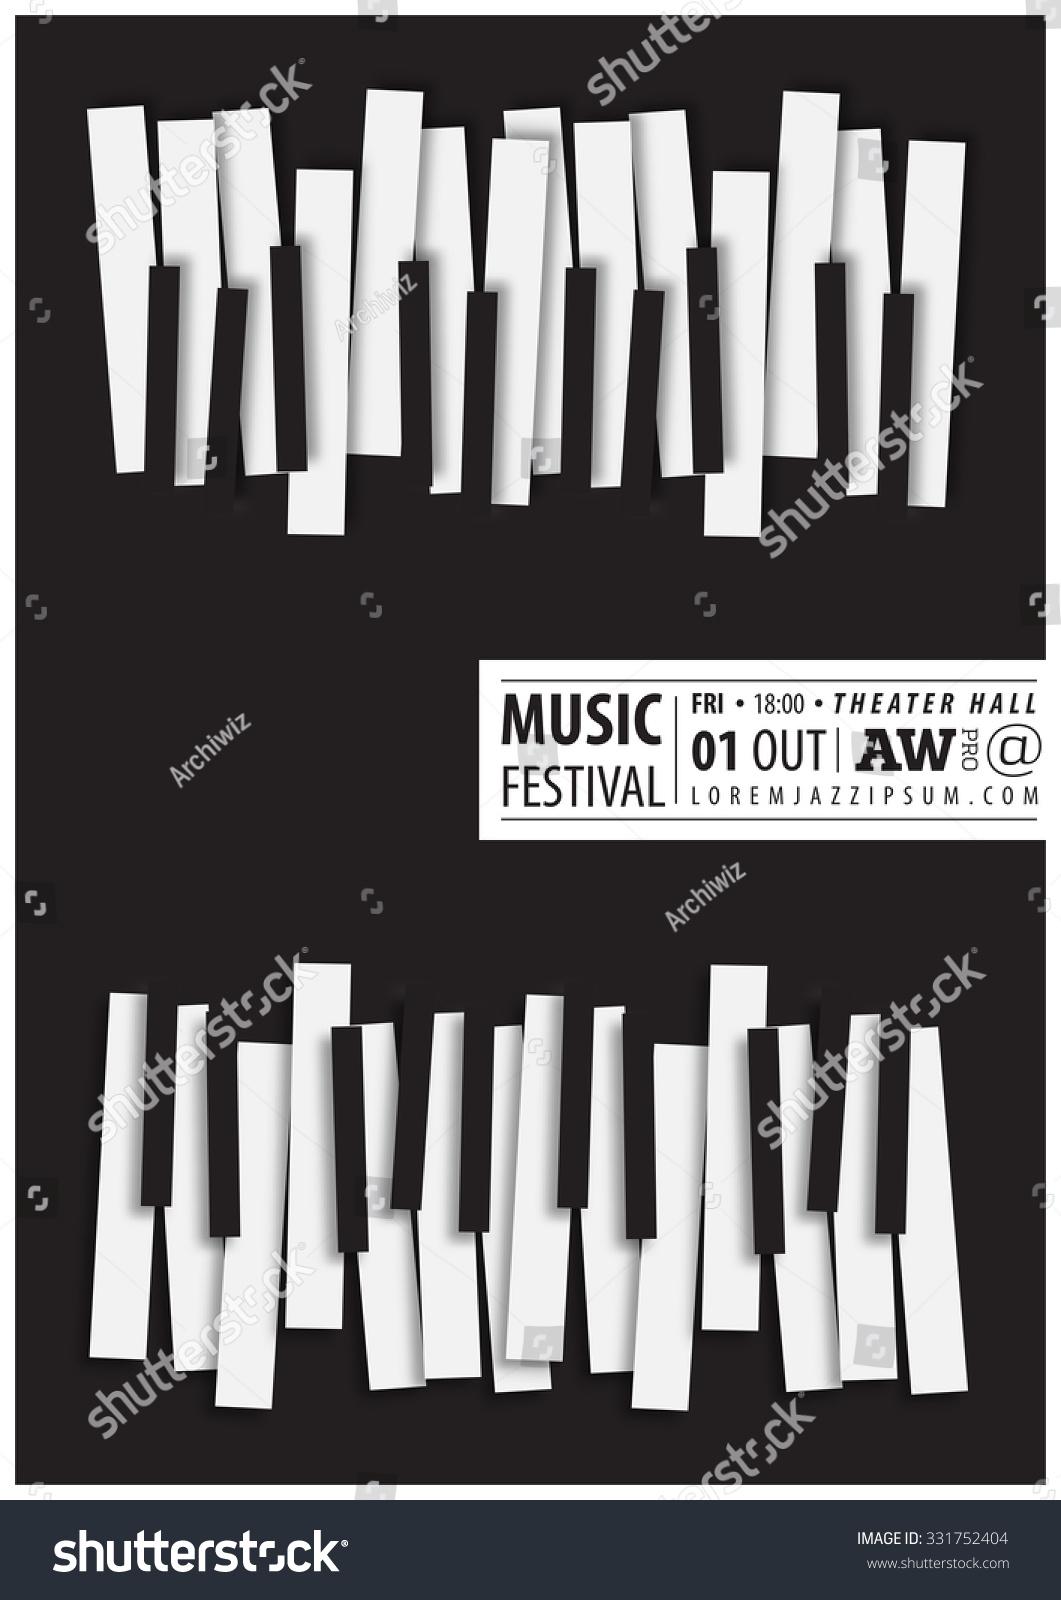 Wpi poster template